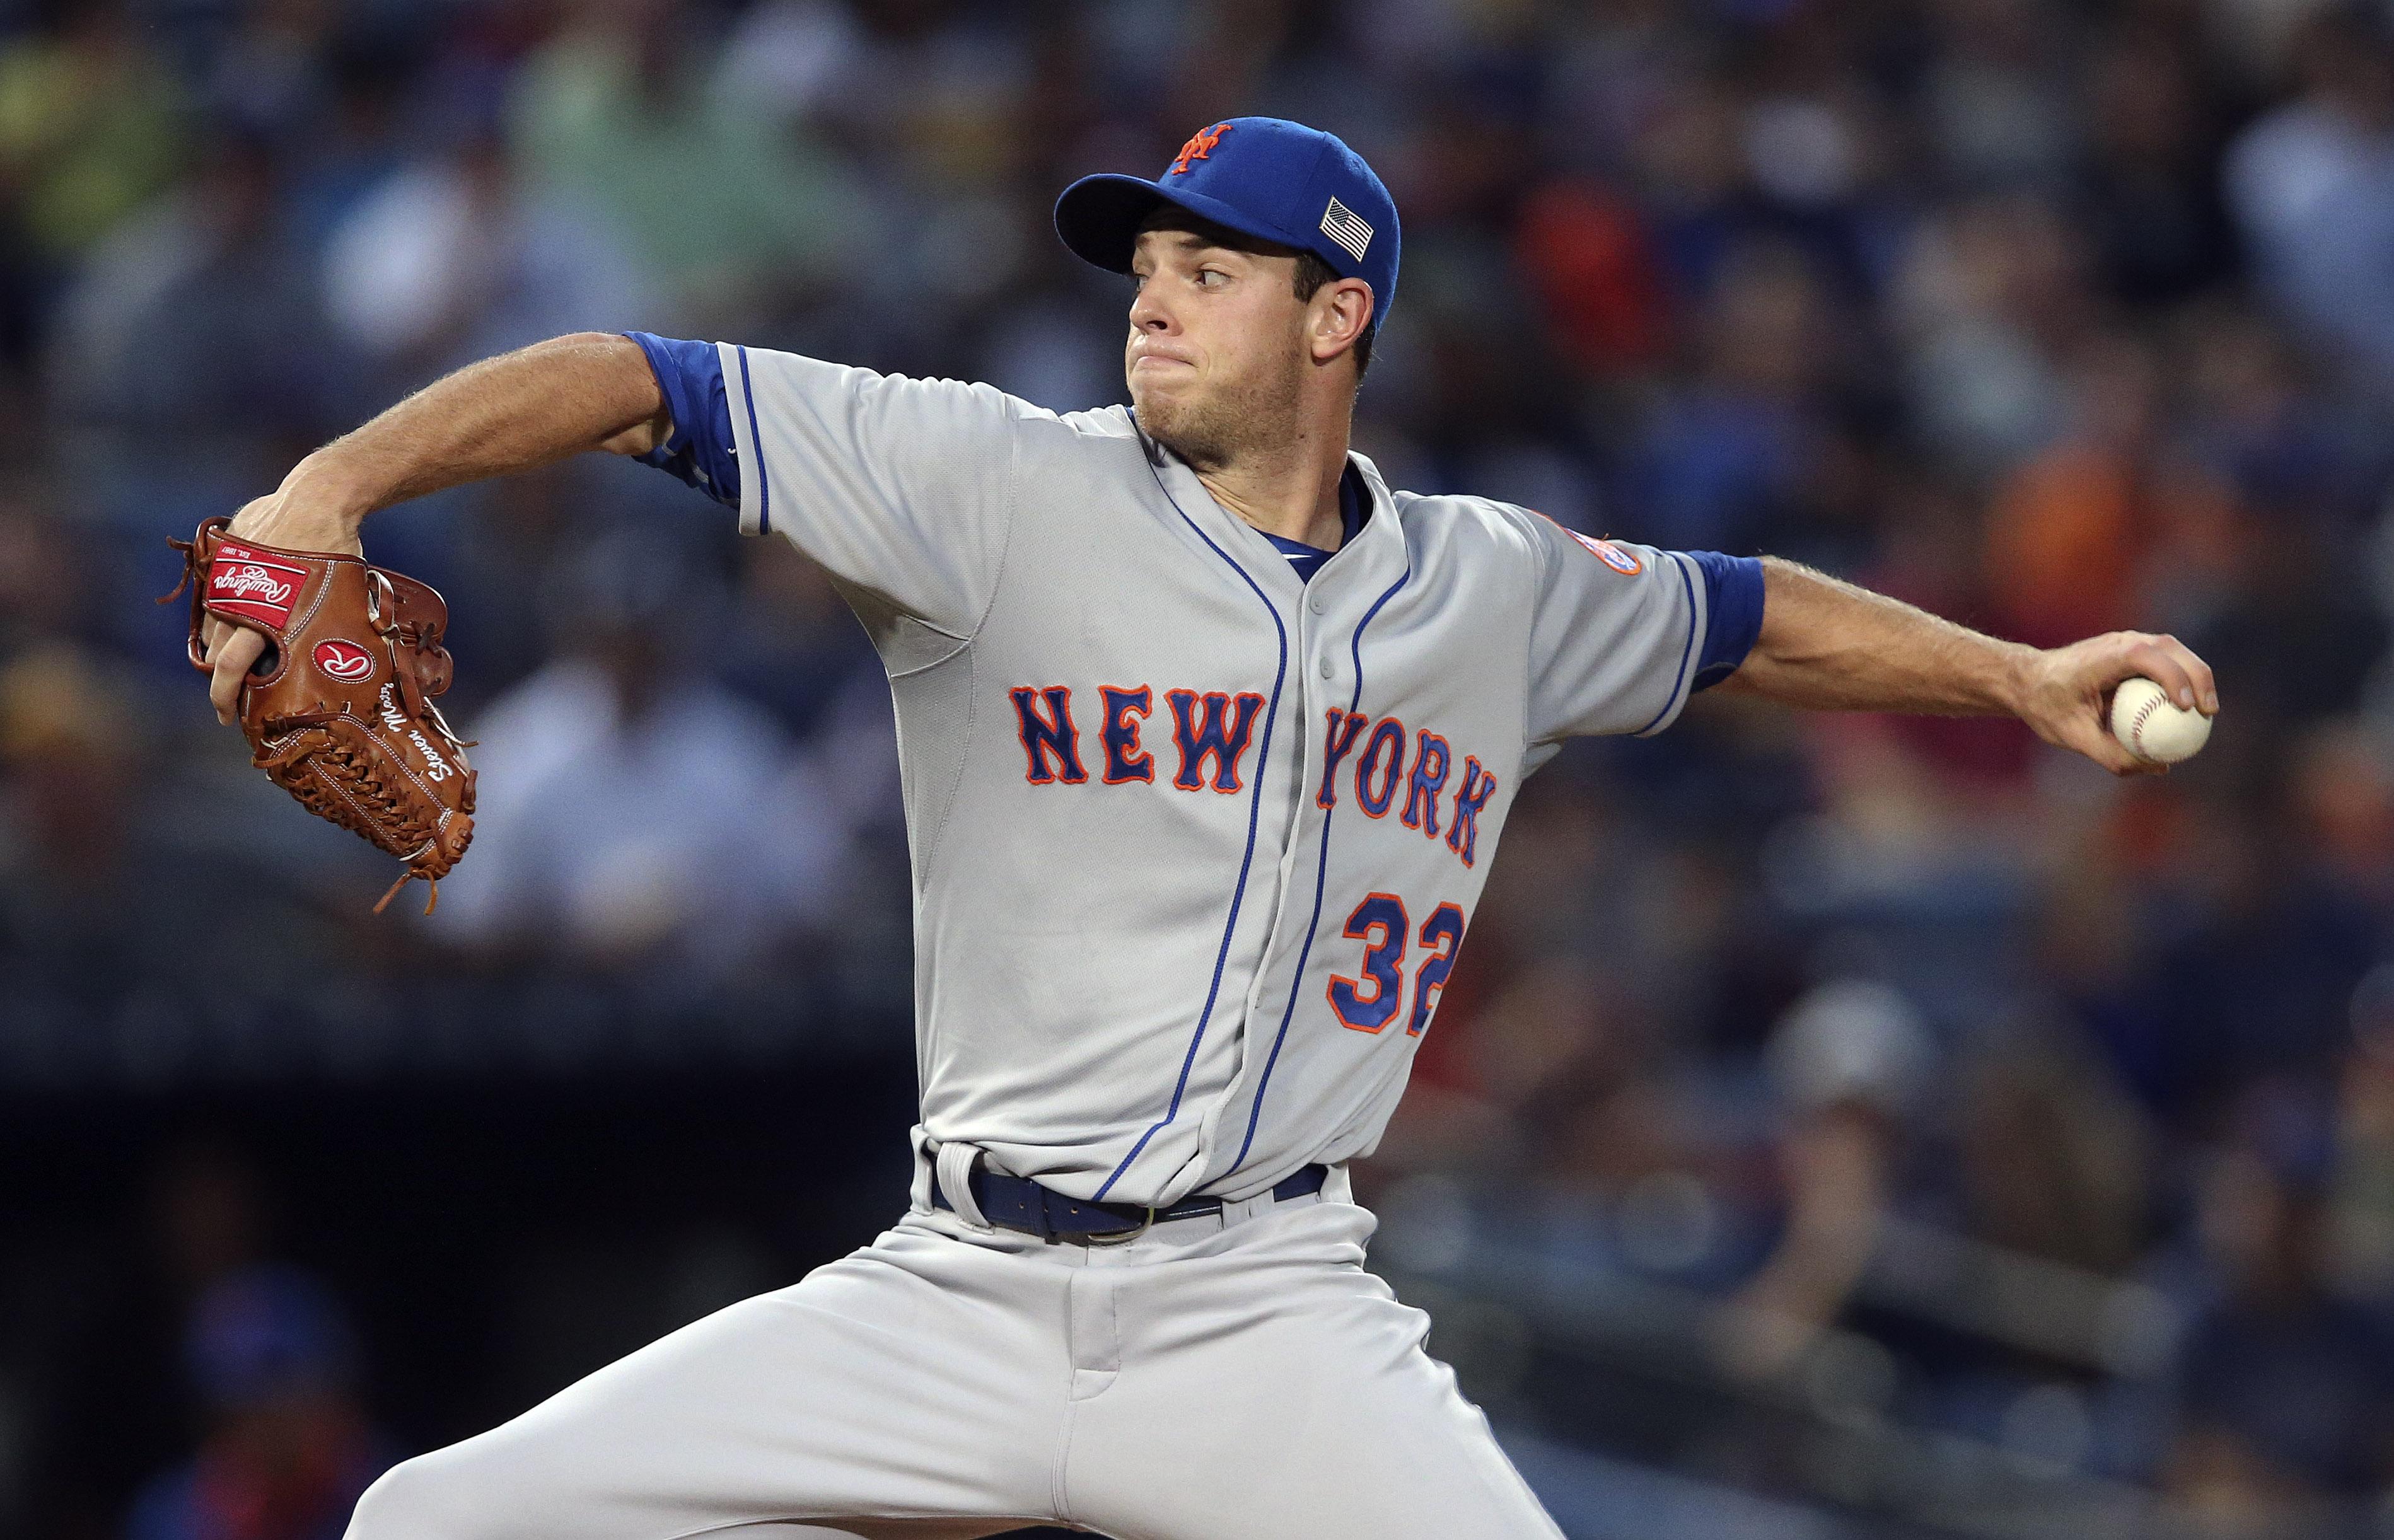 New York Mets starting pitcher Steven Matz (32) works during the first inning of a baseball game against the Atlanta Braves on Friday, Sept. 11, 2015, in Atlanta. (AP Photo/John Bazemore)